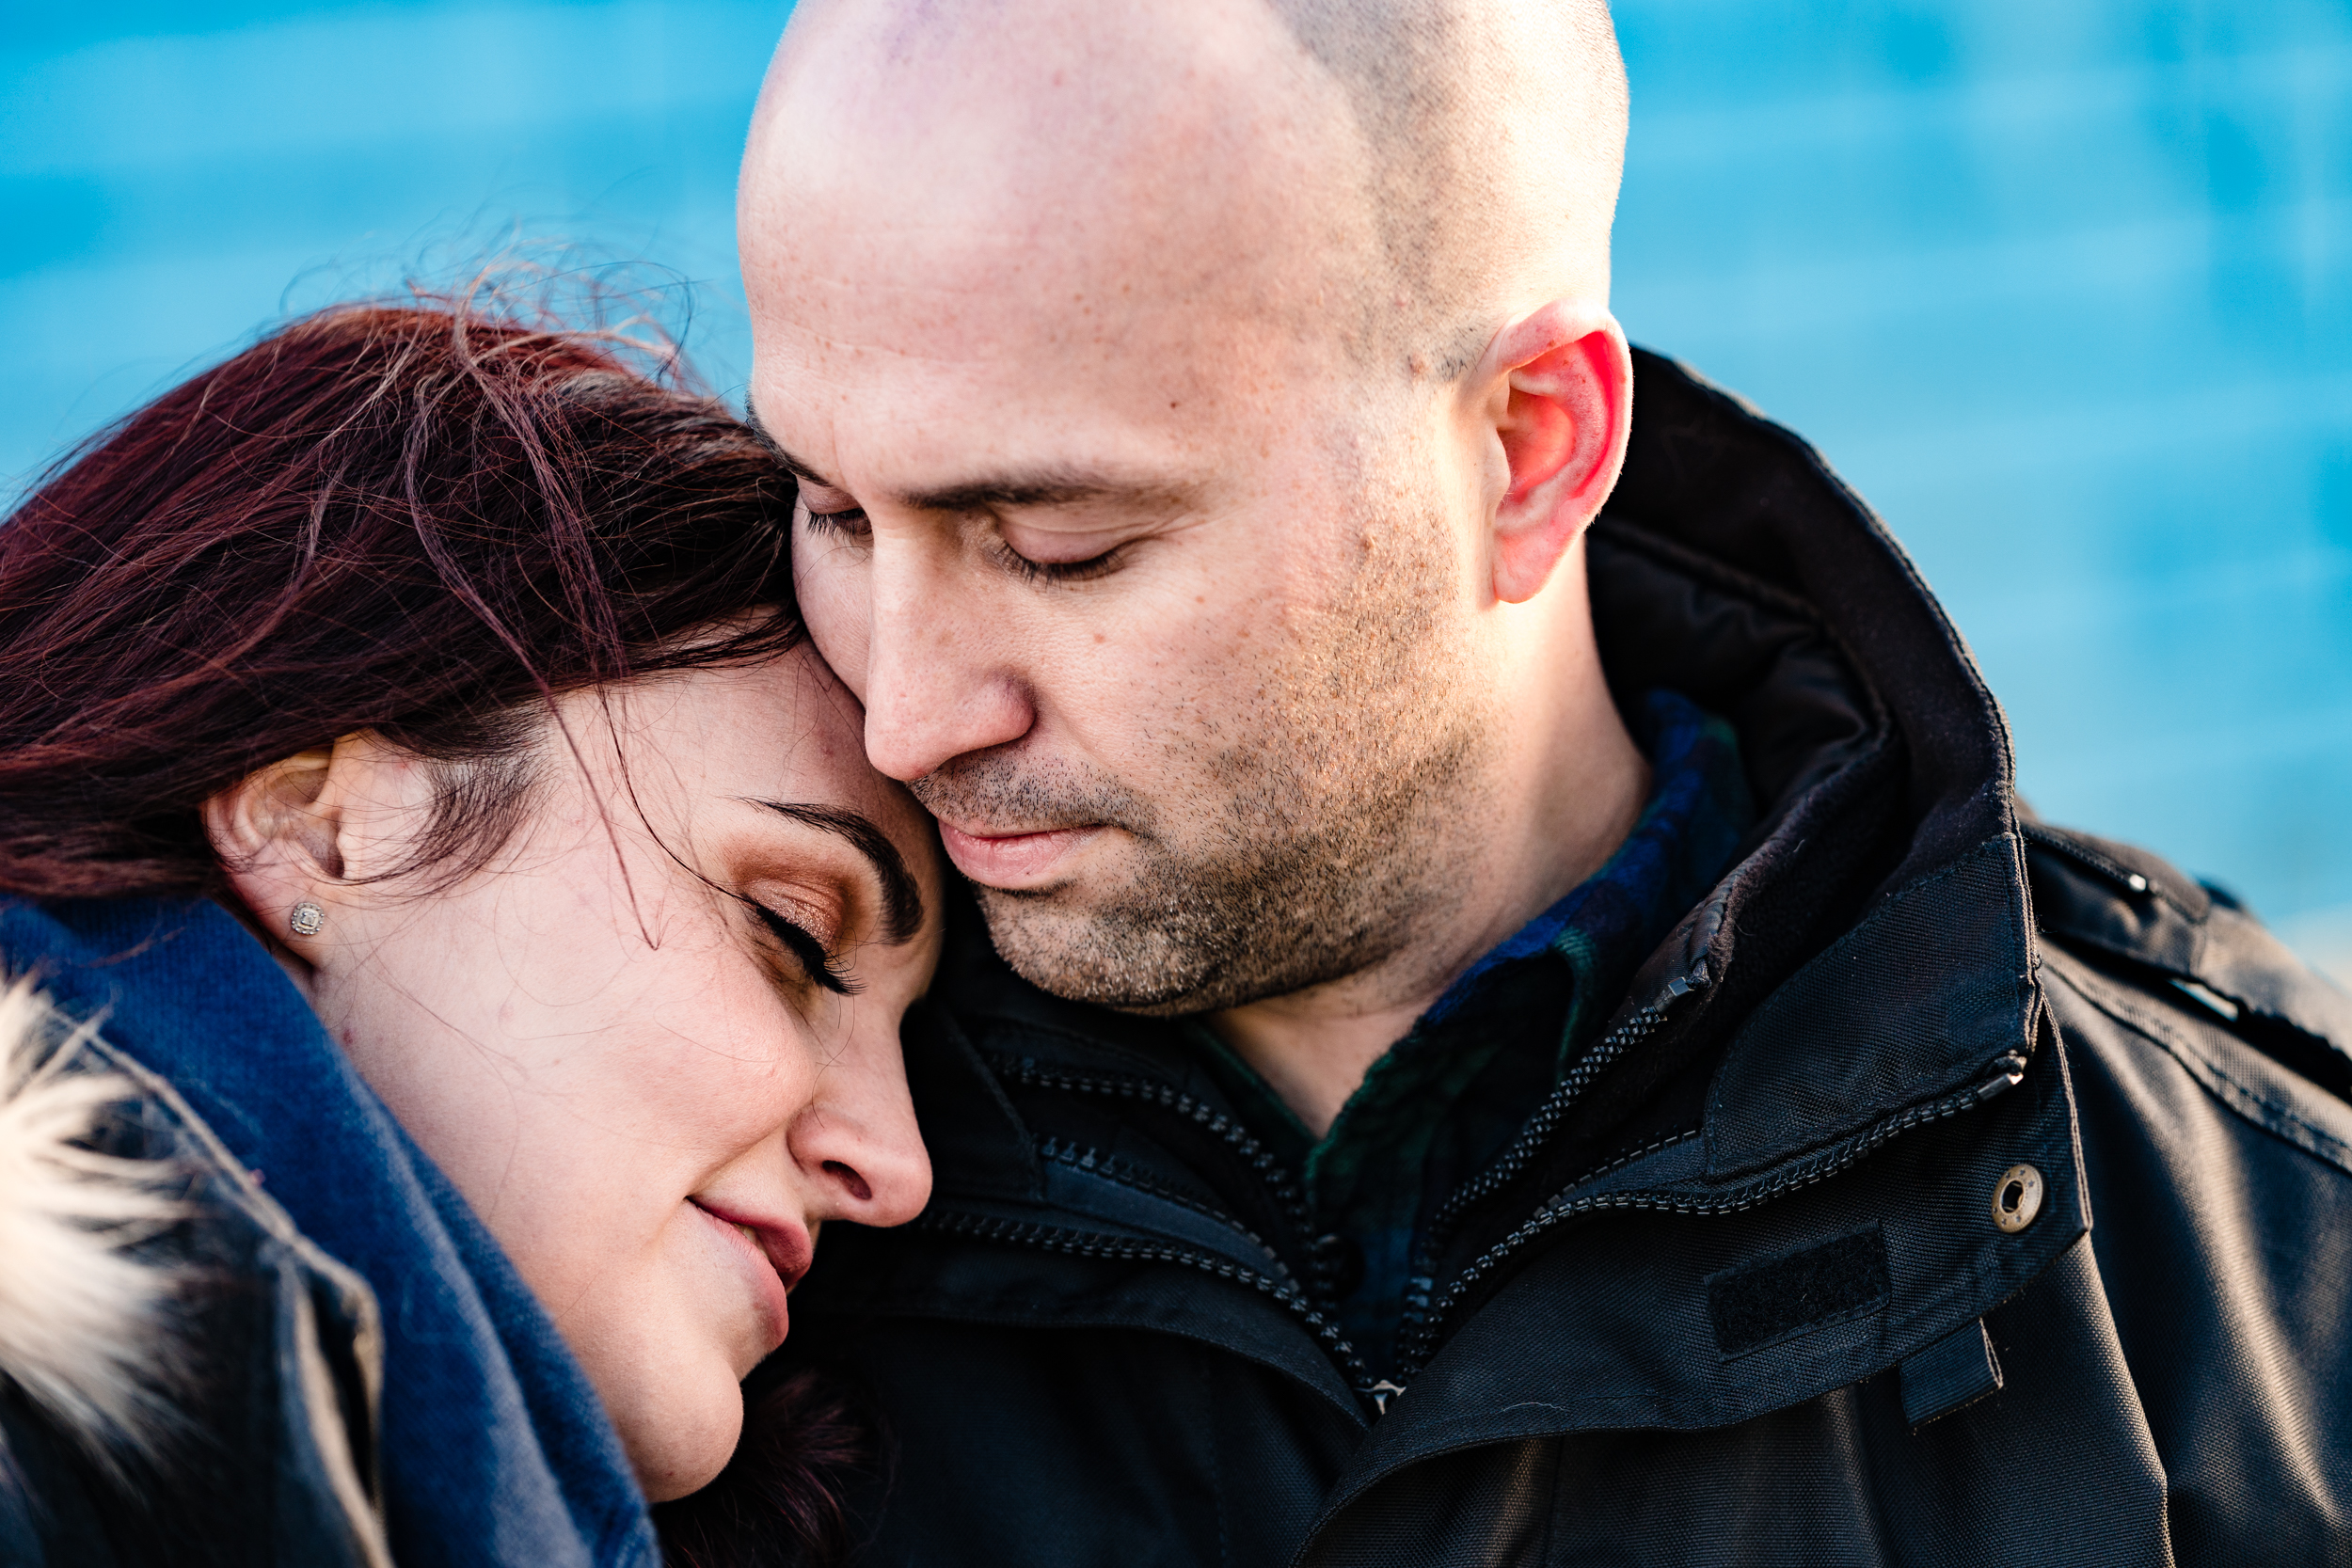 Sarah&Shayne-Halifax-engagement-weddingphotography-weddingphotographers-novascotia (10 of 41).jpg